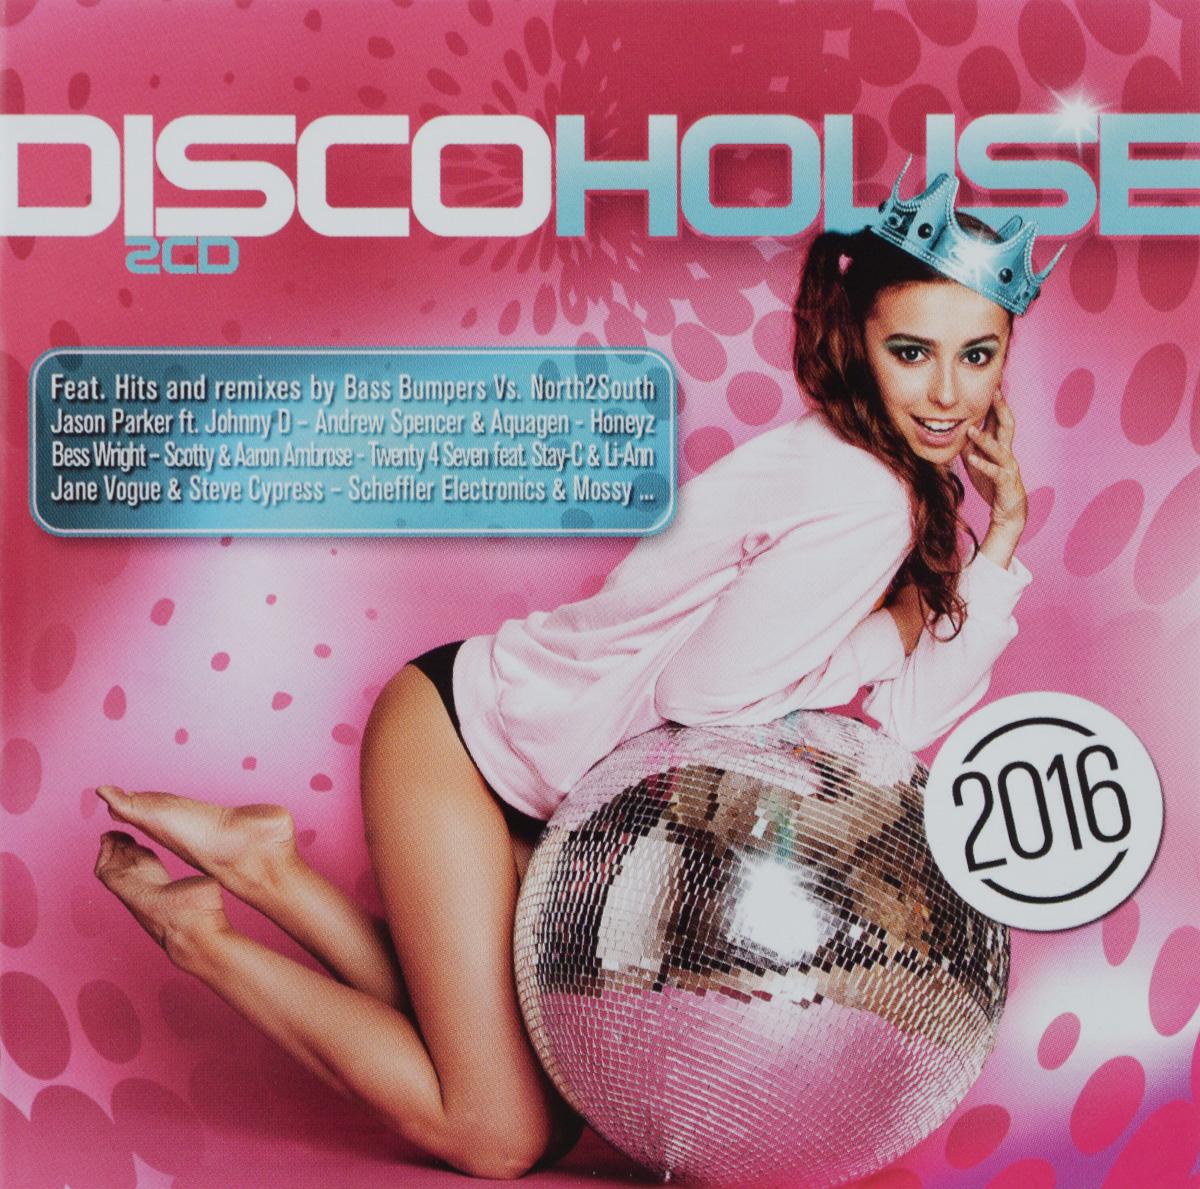 Disco House 2016 (2 CD) disco house 2015 2 cd